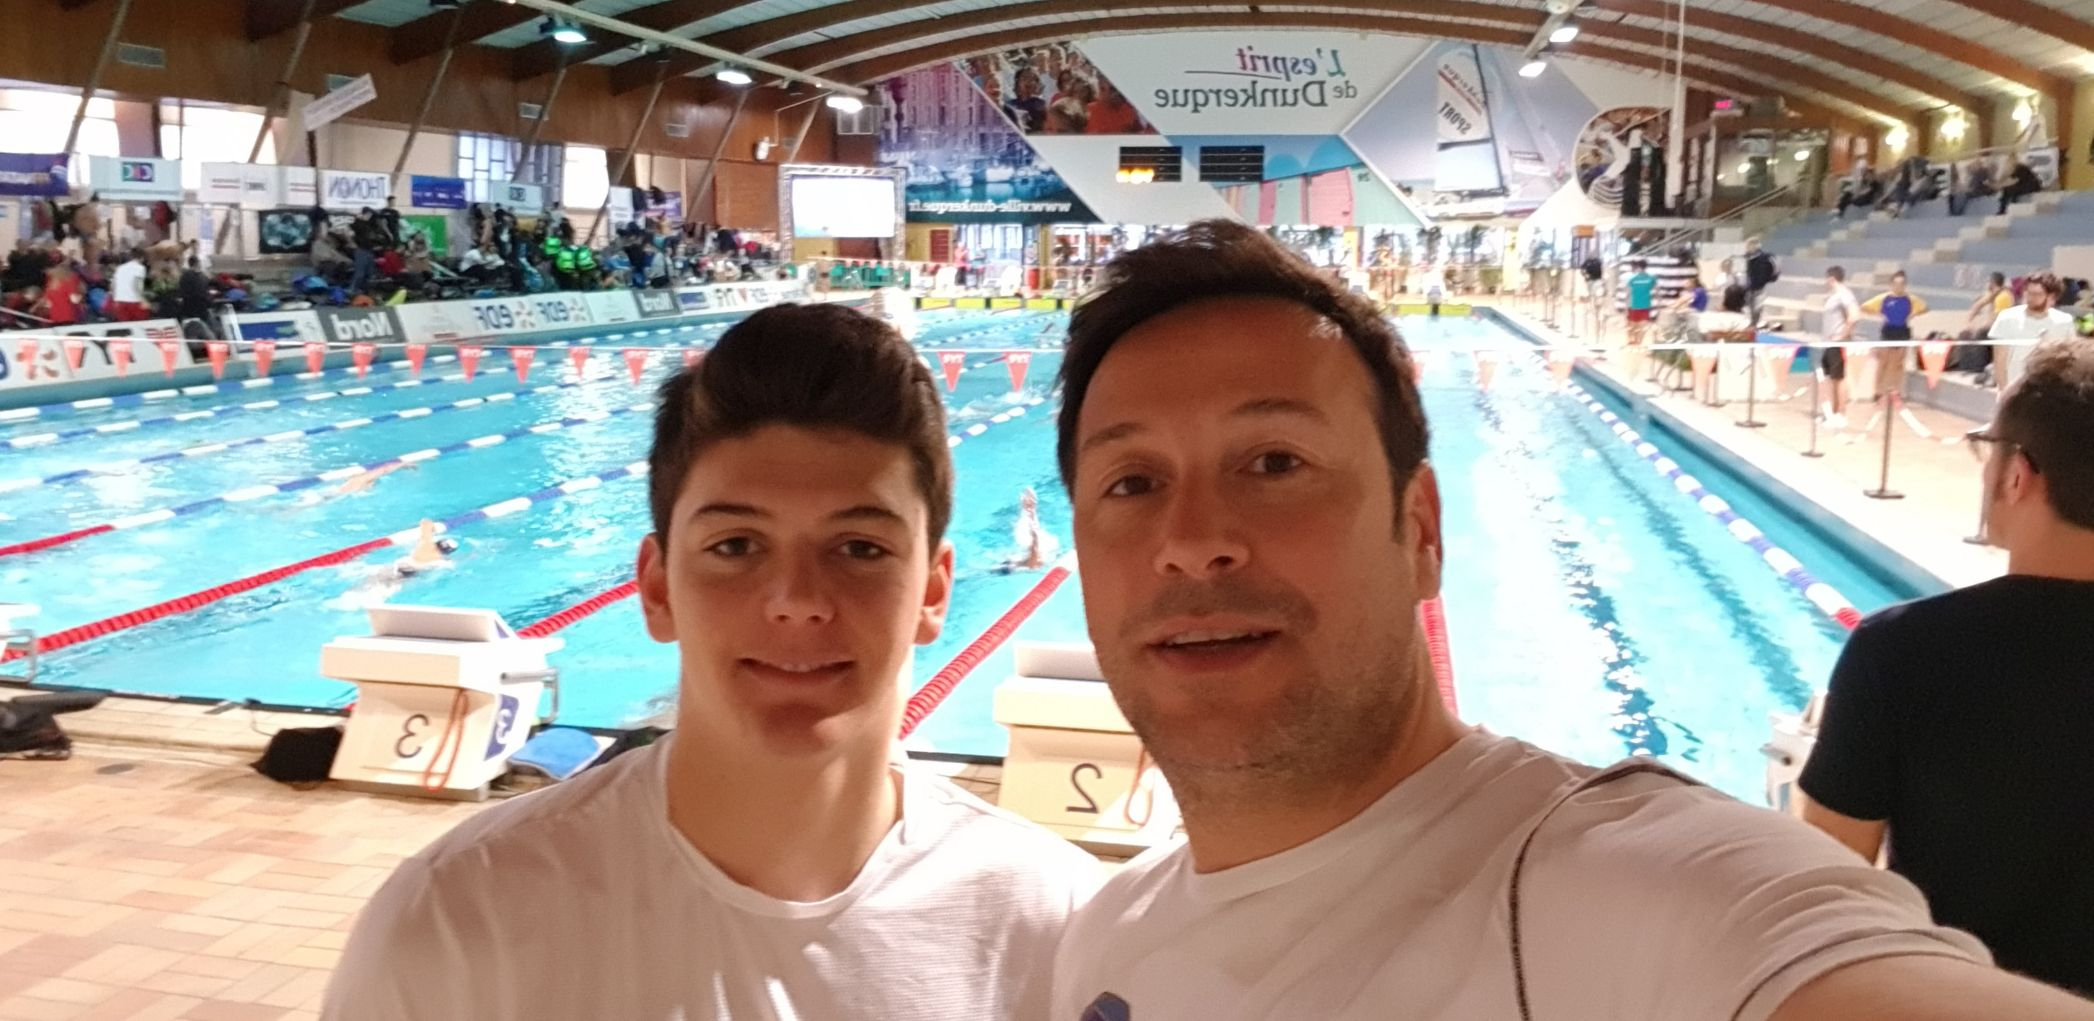 Championnats De France Juniors-50M-Dunkerque concernant Piscine Paul Asseman